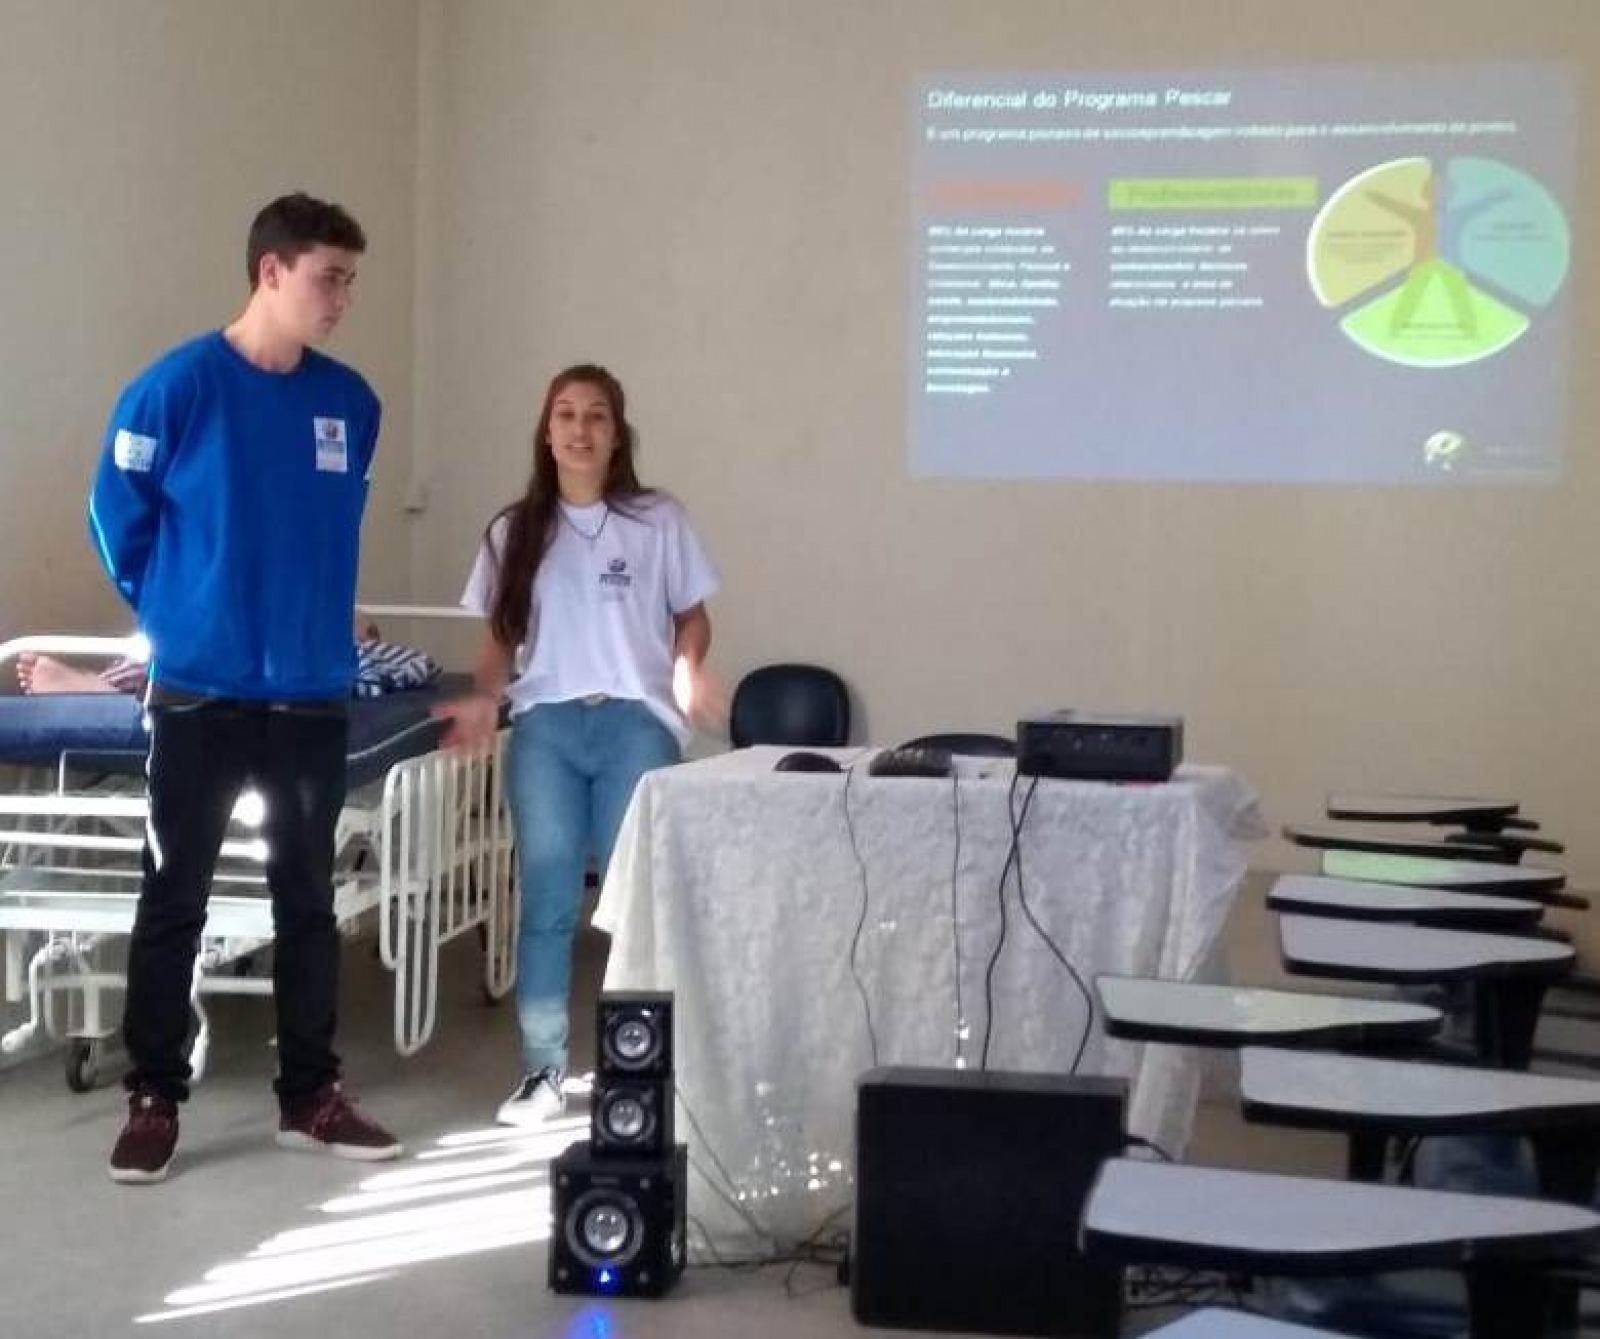 Projeto Pescar 2018